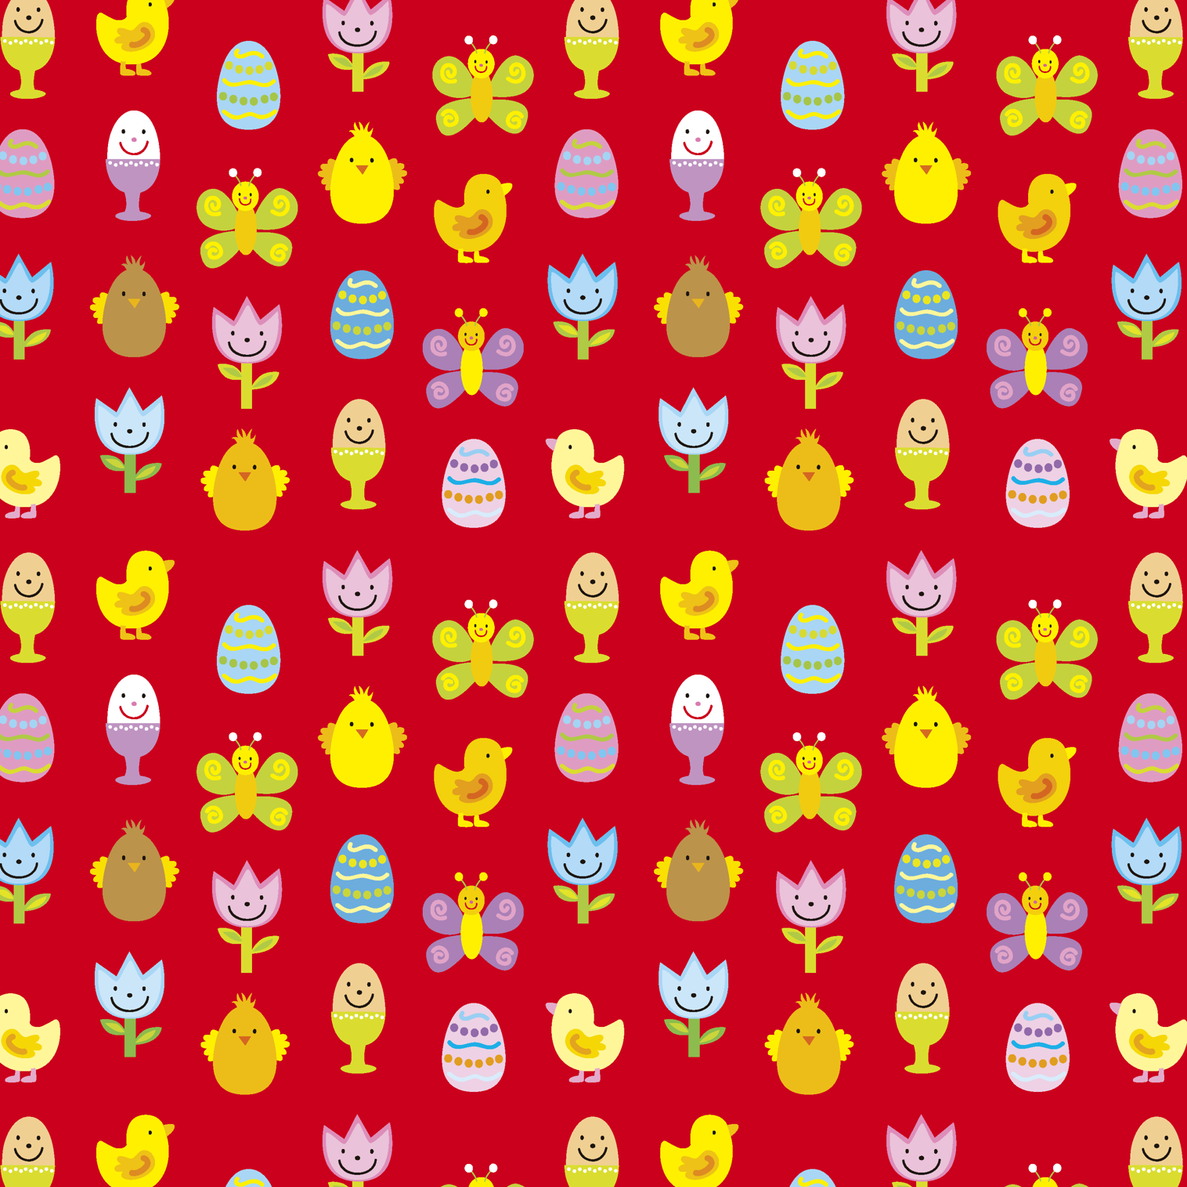 painted_eggs fabric by studioboe! on Spoonflower - custom fabric